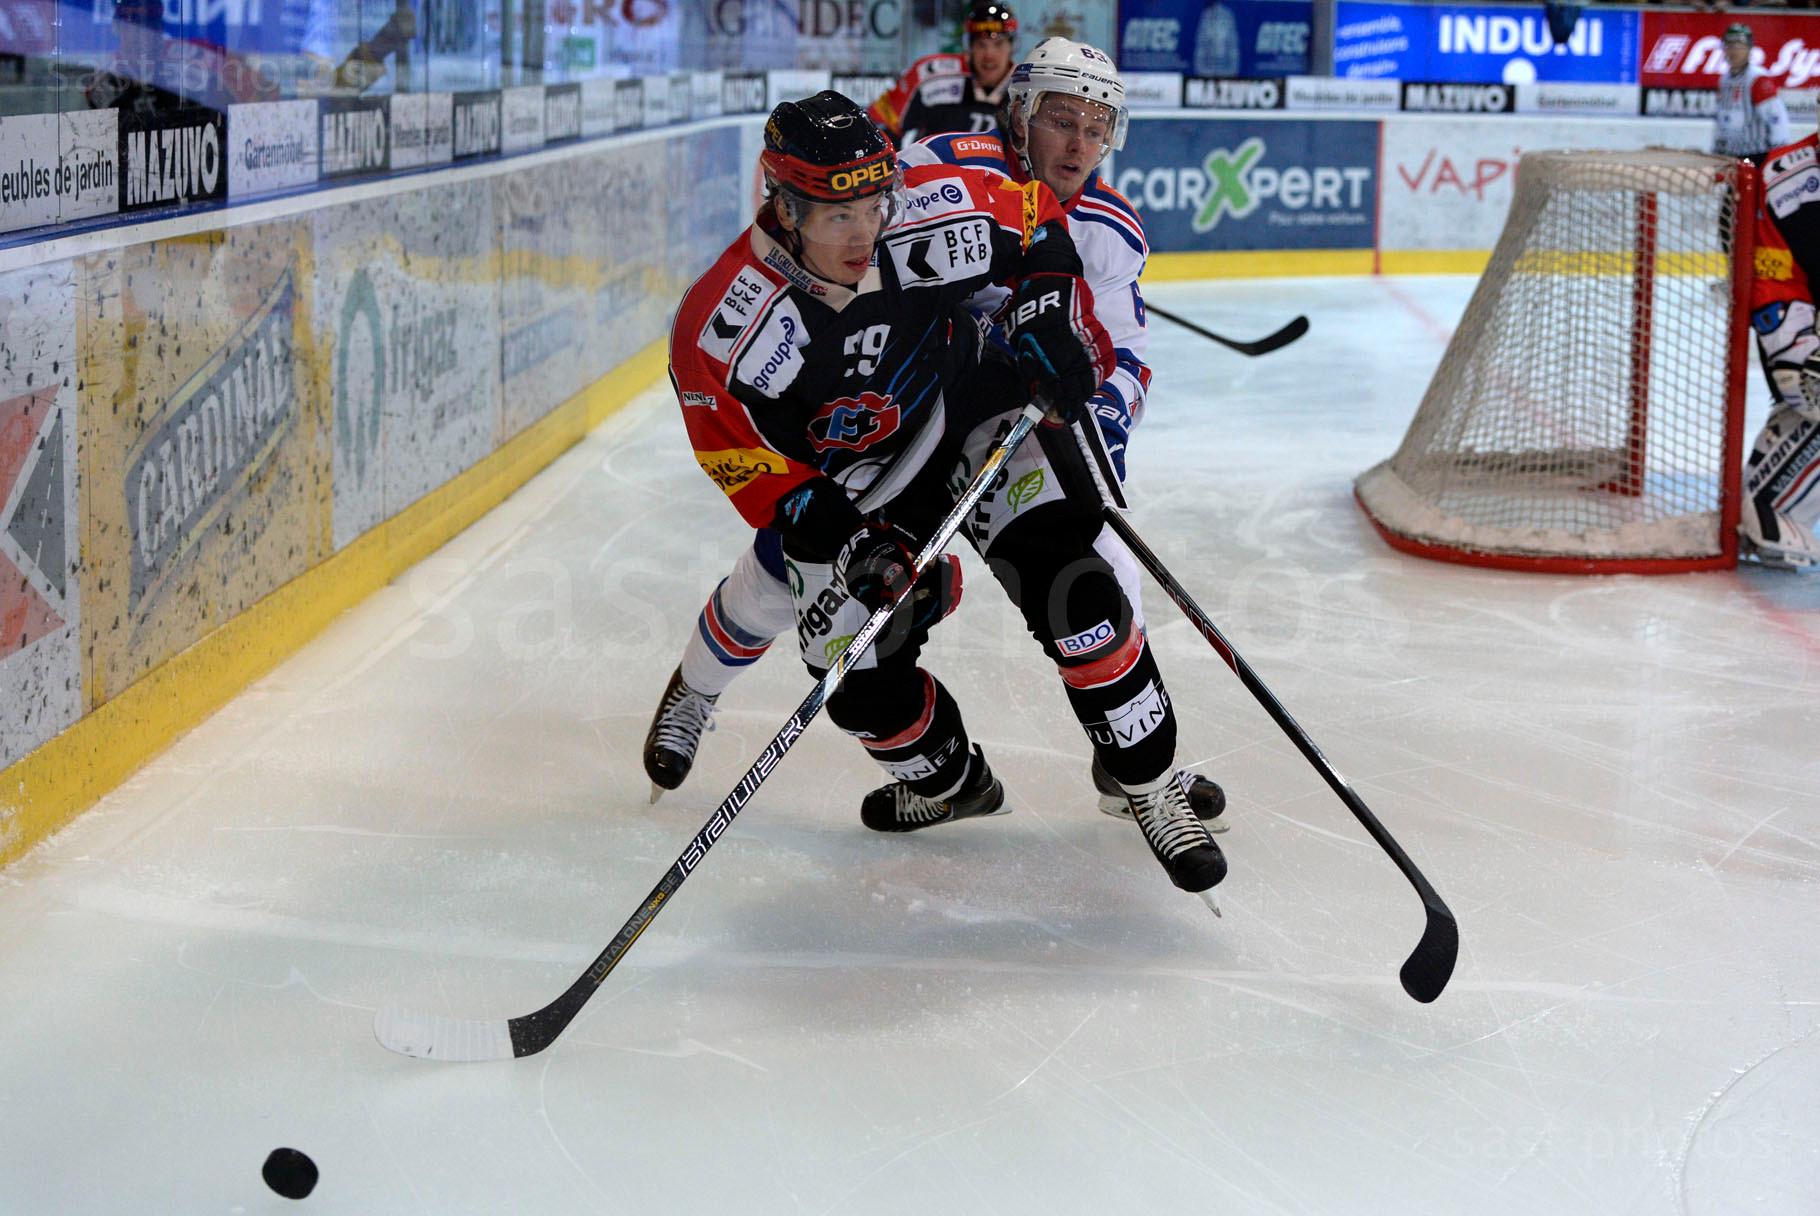 Jeremie Kamerzin (L. Fribourg) gegen Evgeny Dadonov (St. Petersburg)